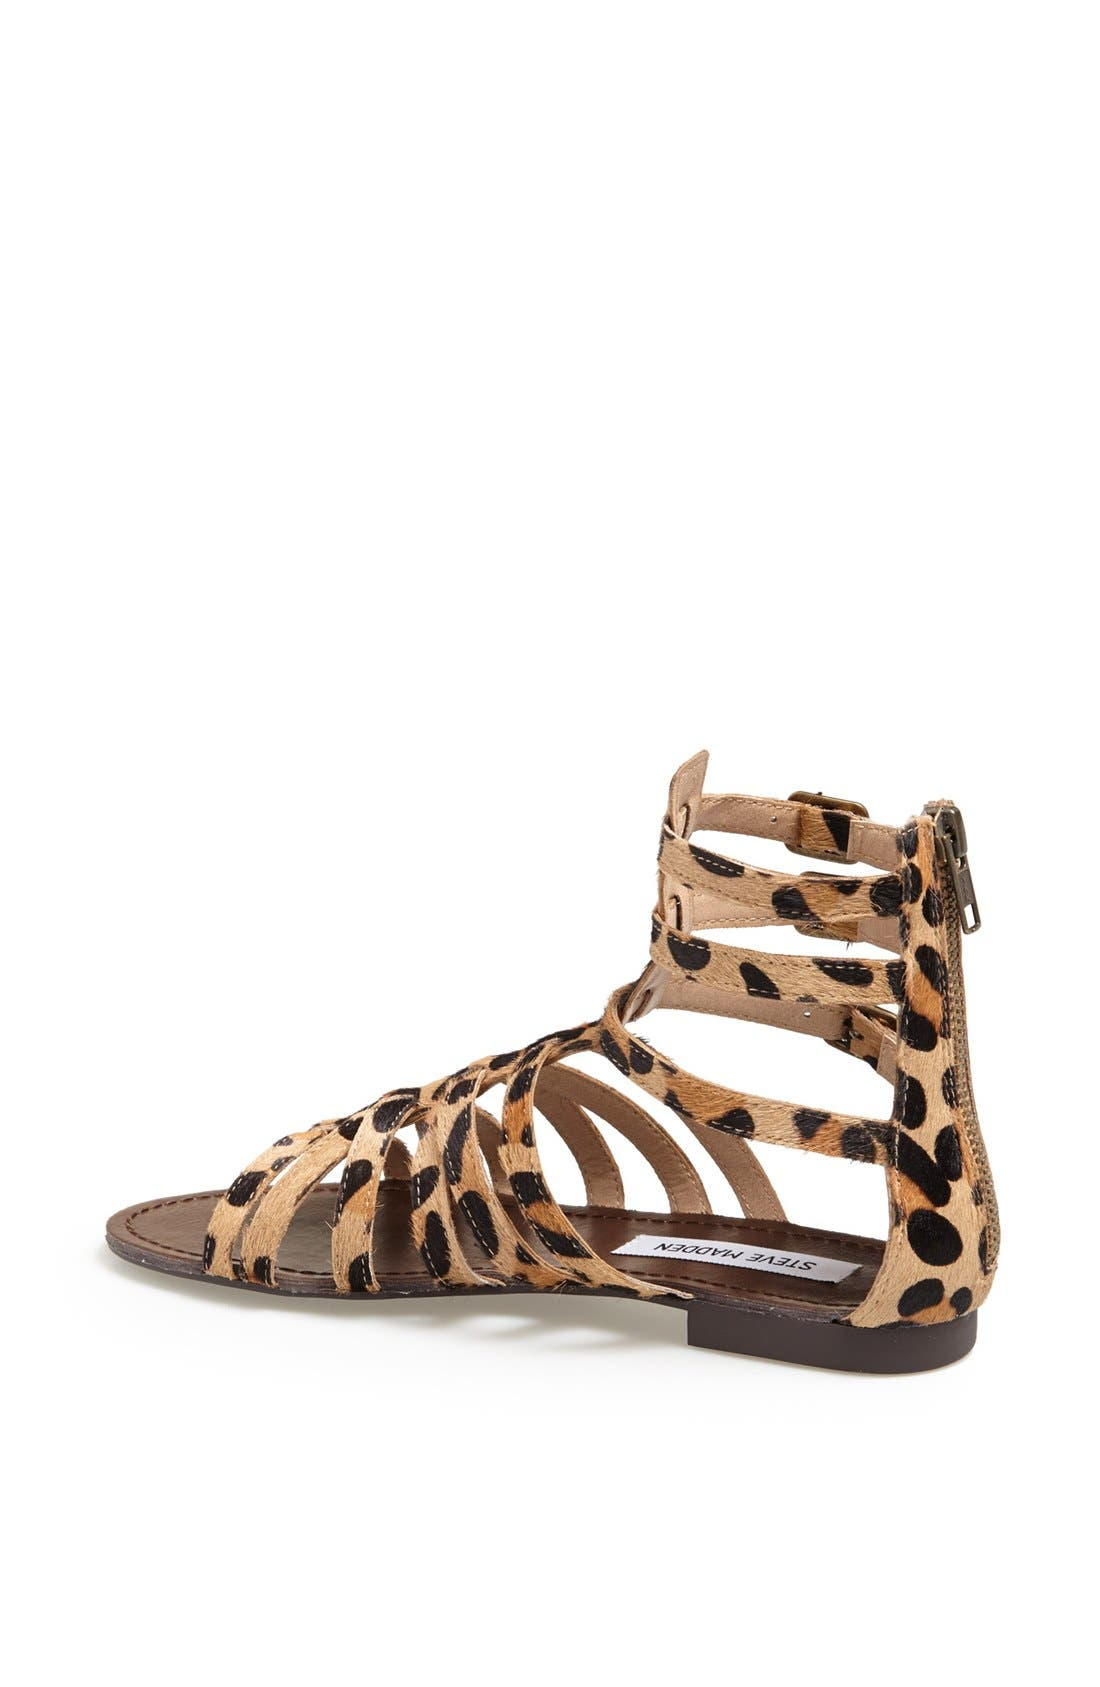 'Plato-S' Sandal,                             Alternate thumbnail 2, color,                             Leopard Stud